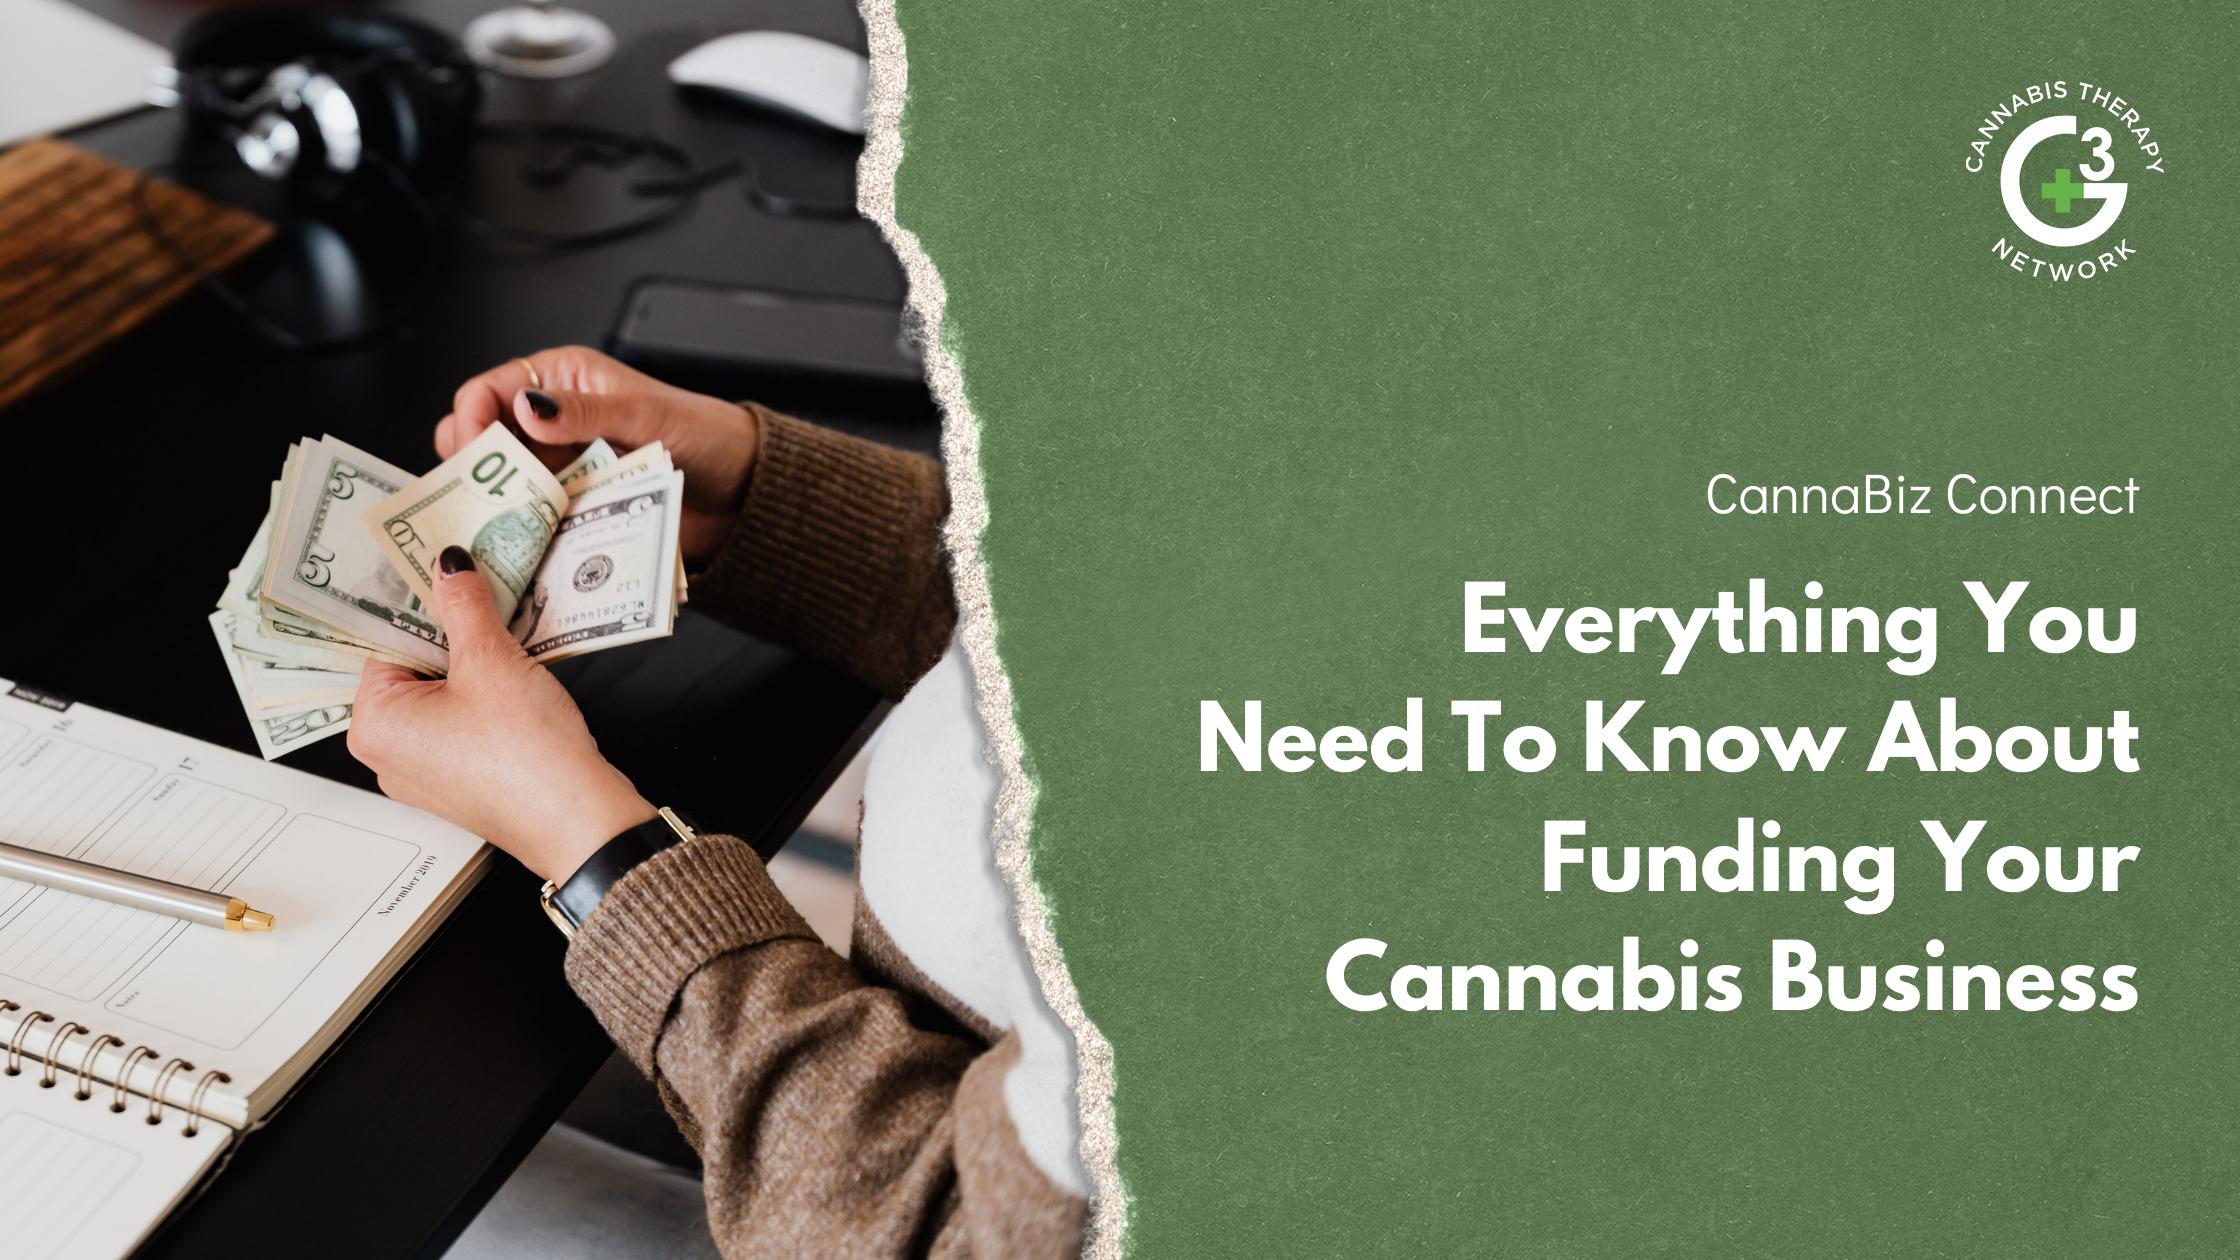 Cannabiz Funding - How to get financing for a marijuana business